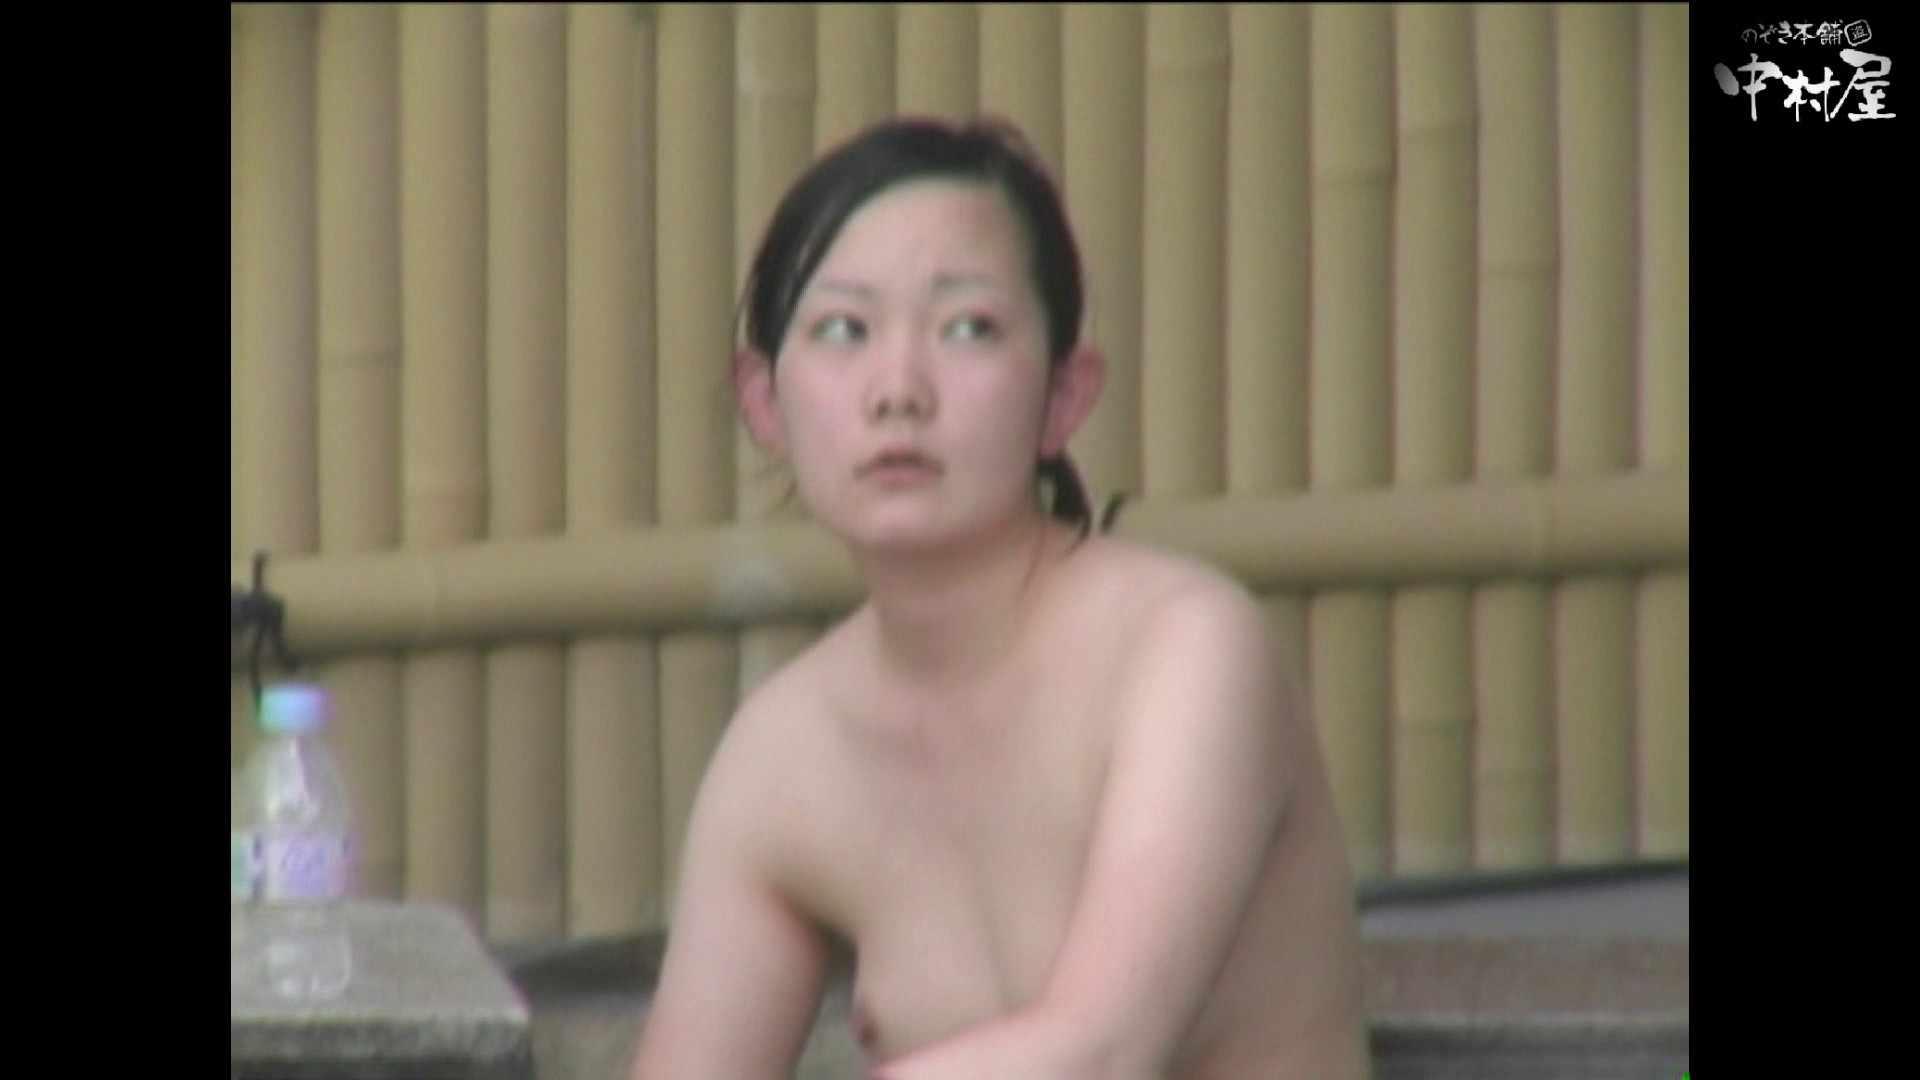 Aquaな露天風呂Vol.892 盗撮 われめAV動画紹介 80画像 8